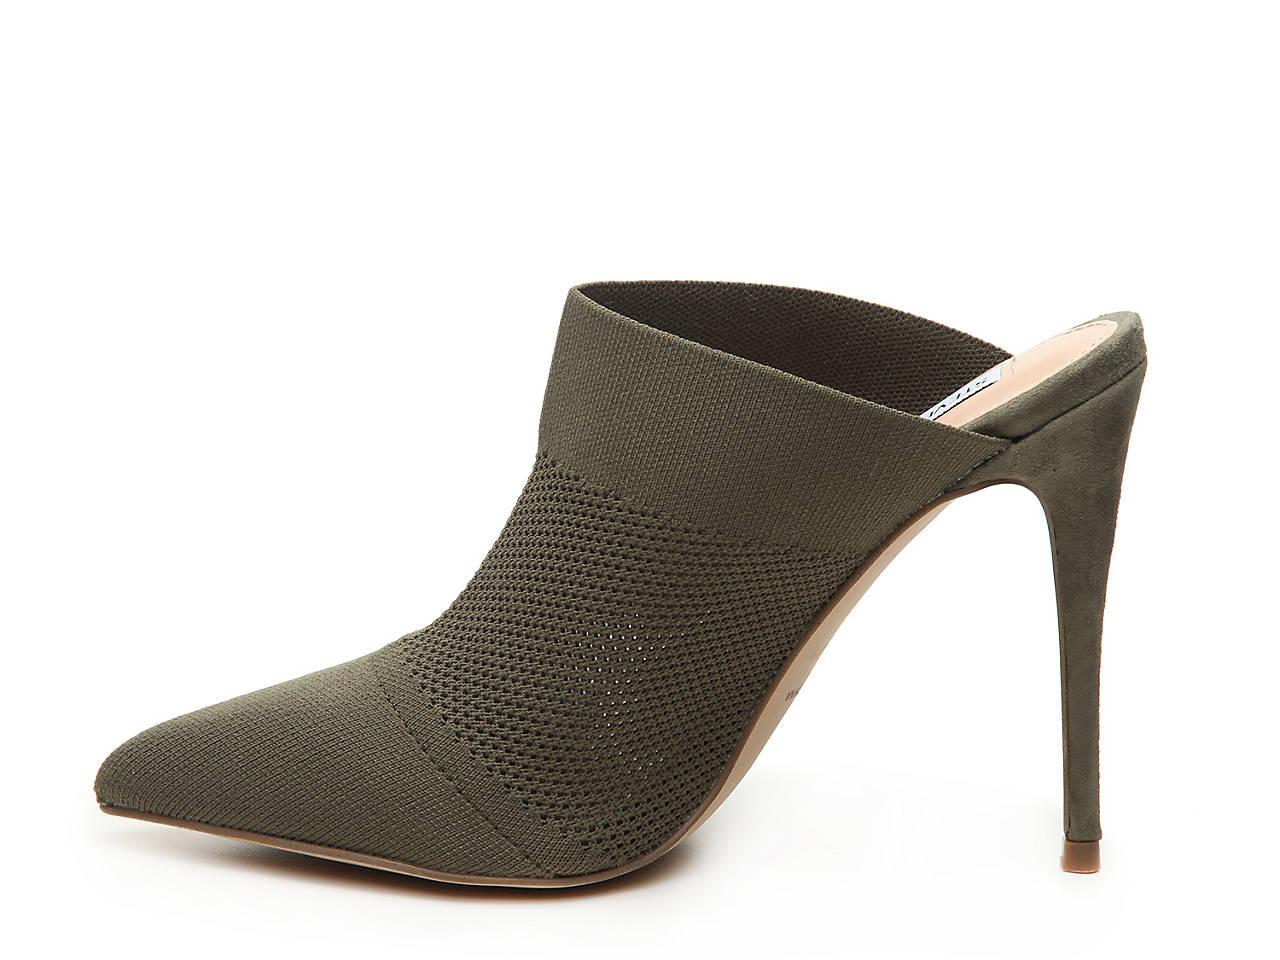 c9cecb5533c Steve Madden Drastic Mule Women s Shoes